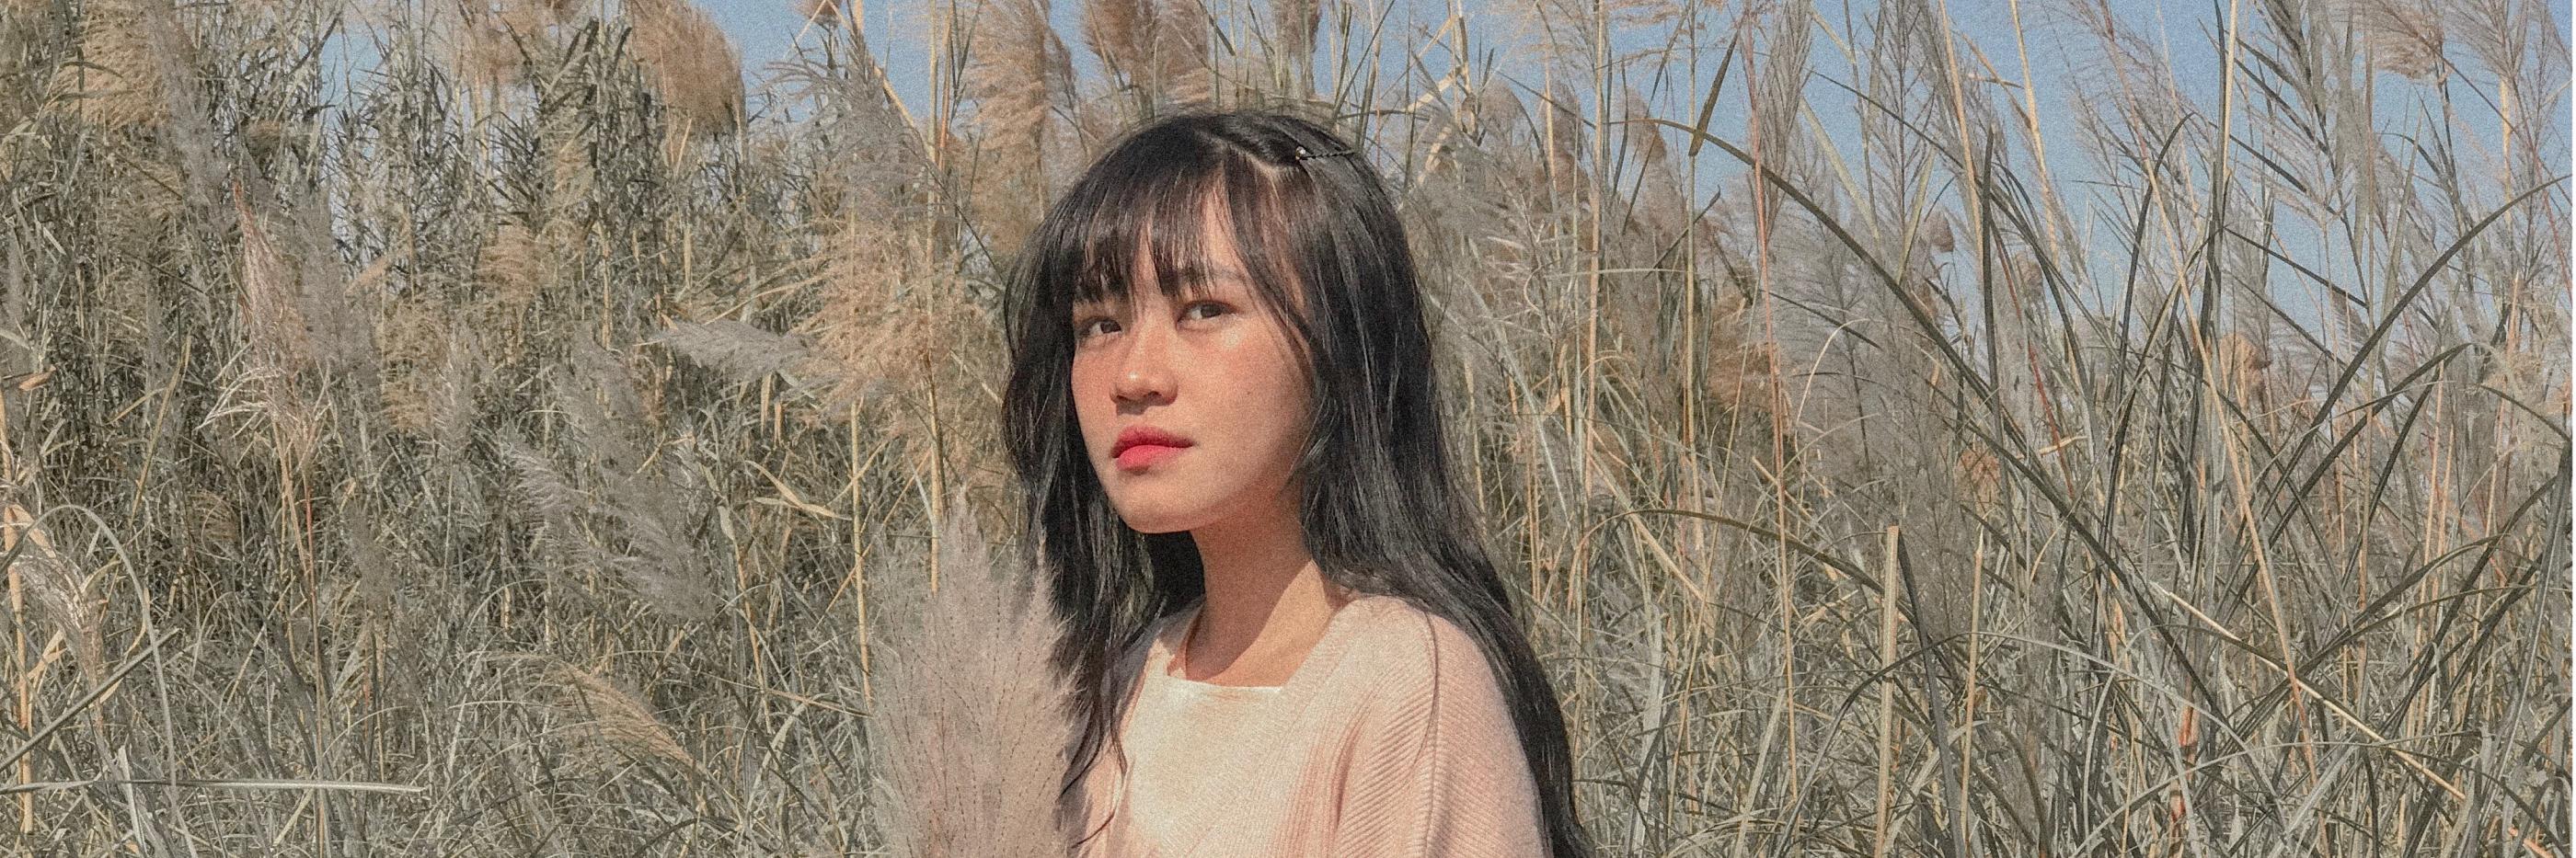 https://gody.vn/blog/kieudiem01633302/post/view-co-lau-o-bai-da-song-hong-ha-noi-7748